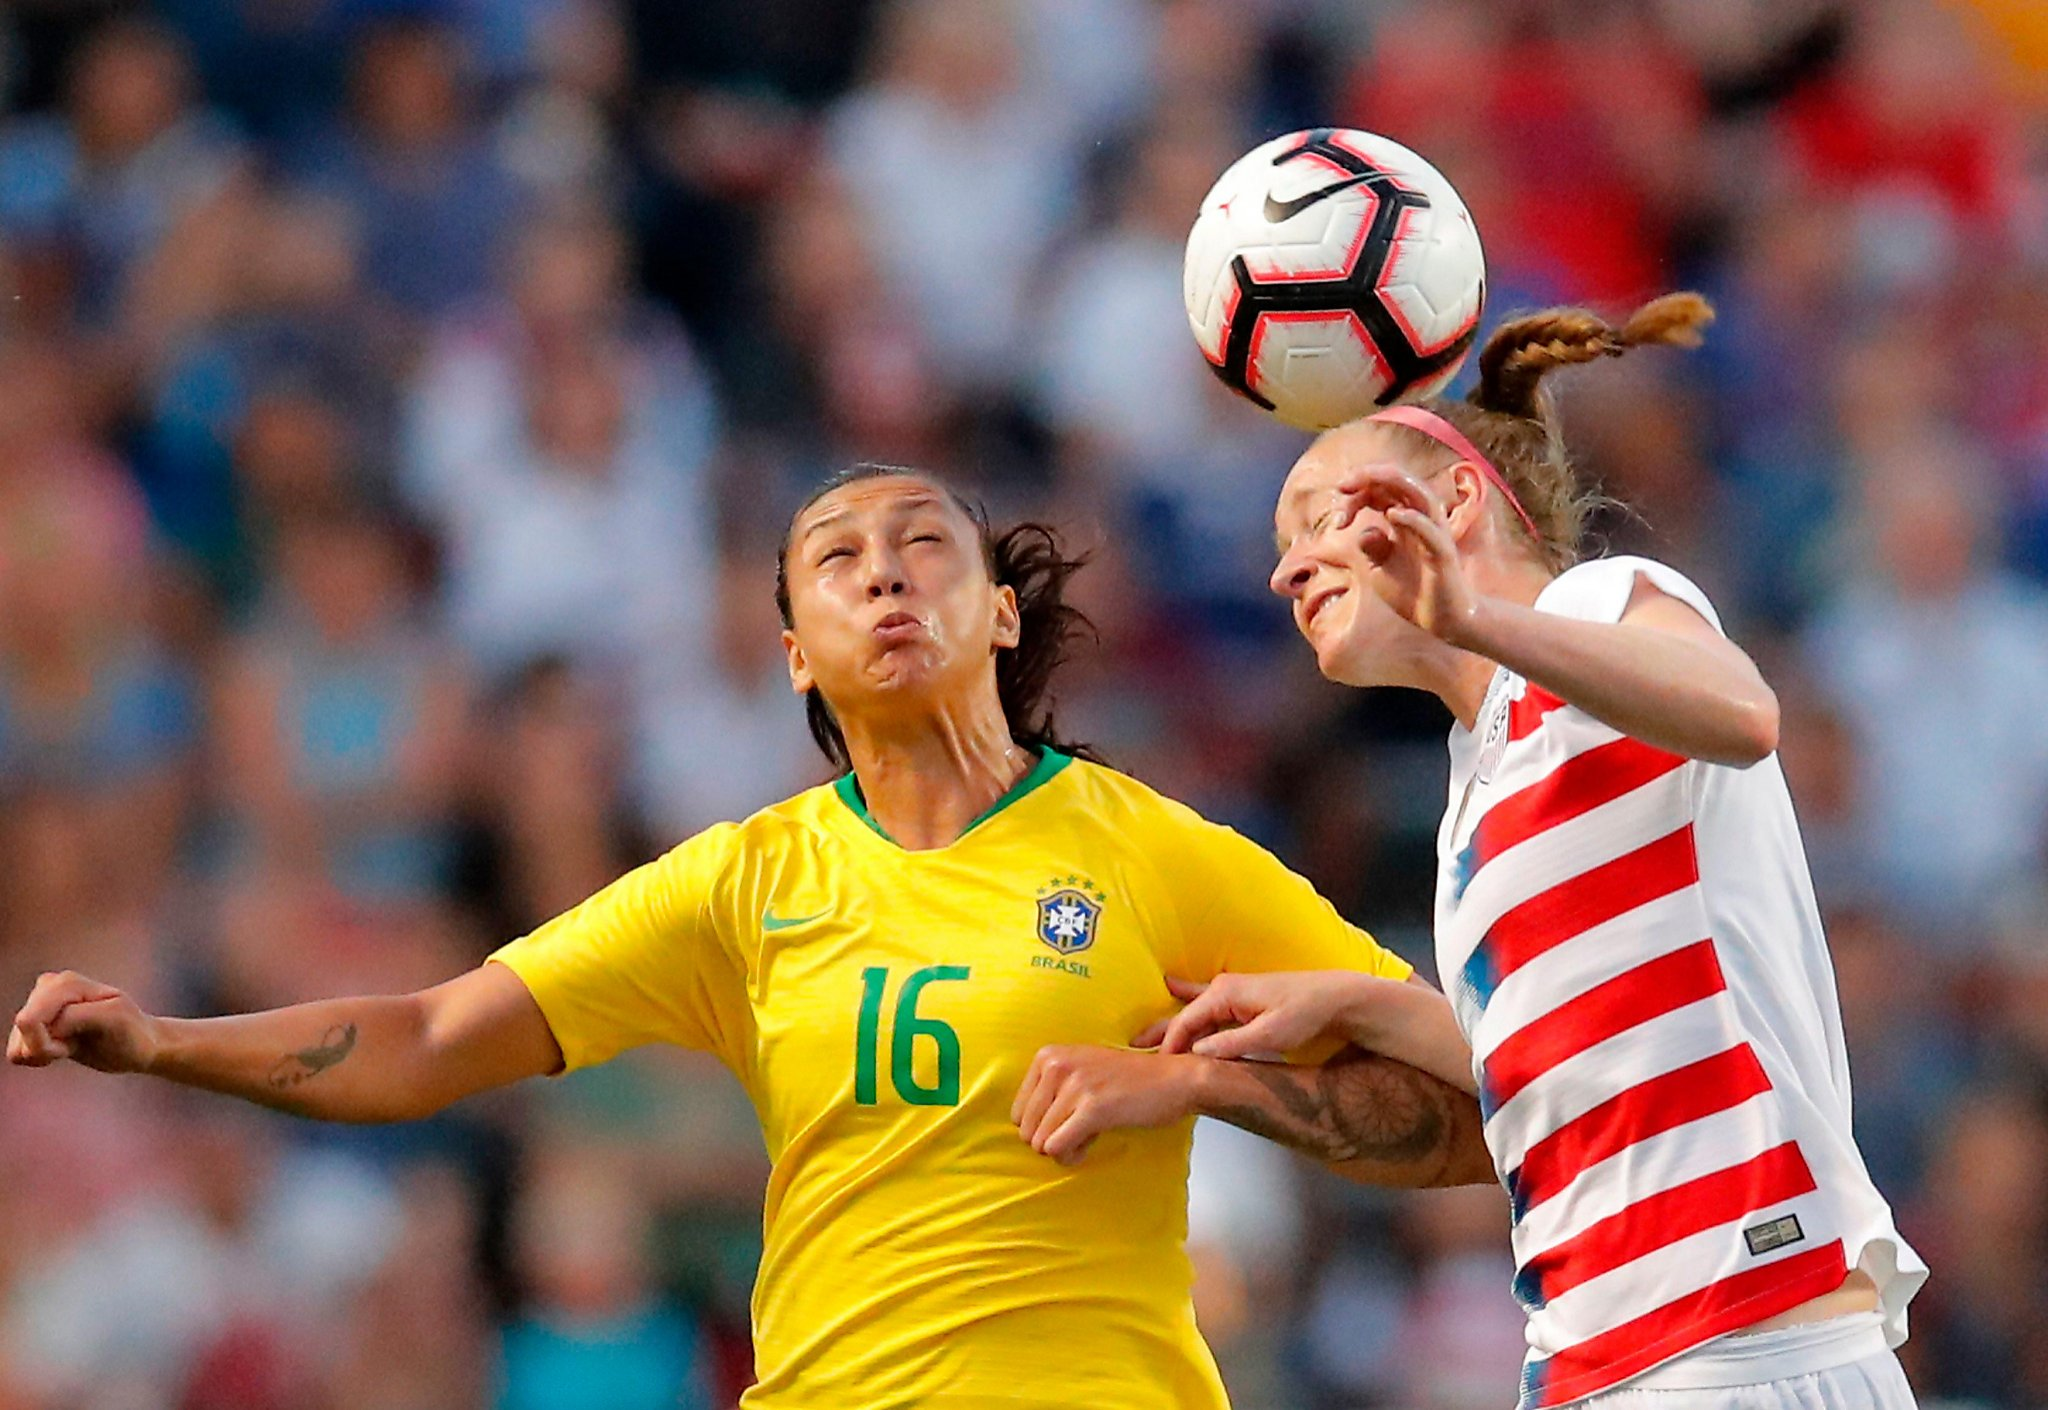 US women's soccer team beats Brazil for Tournament of Nations title